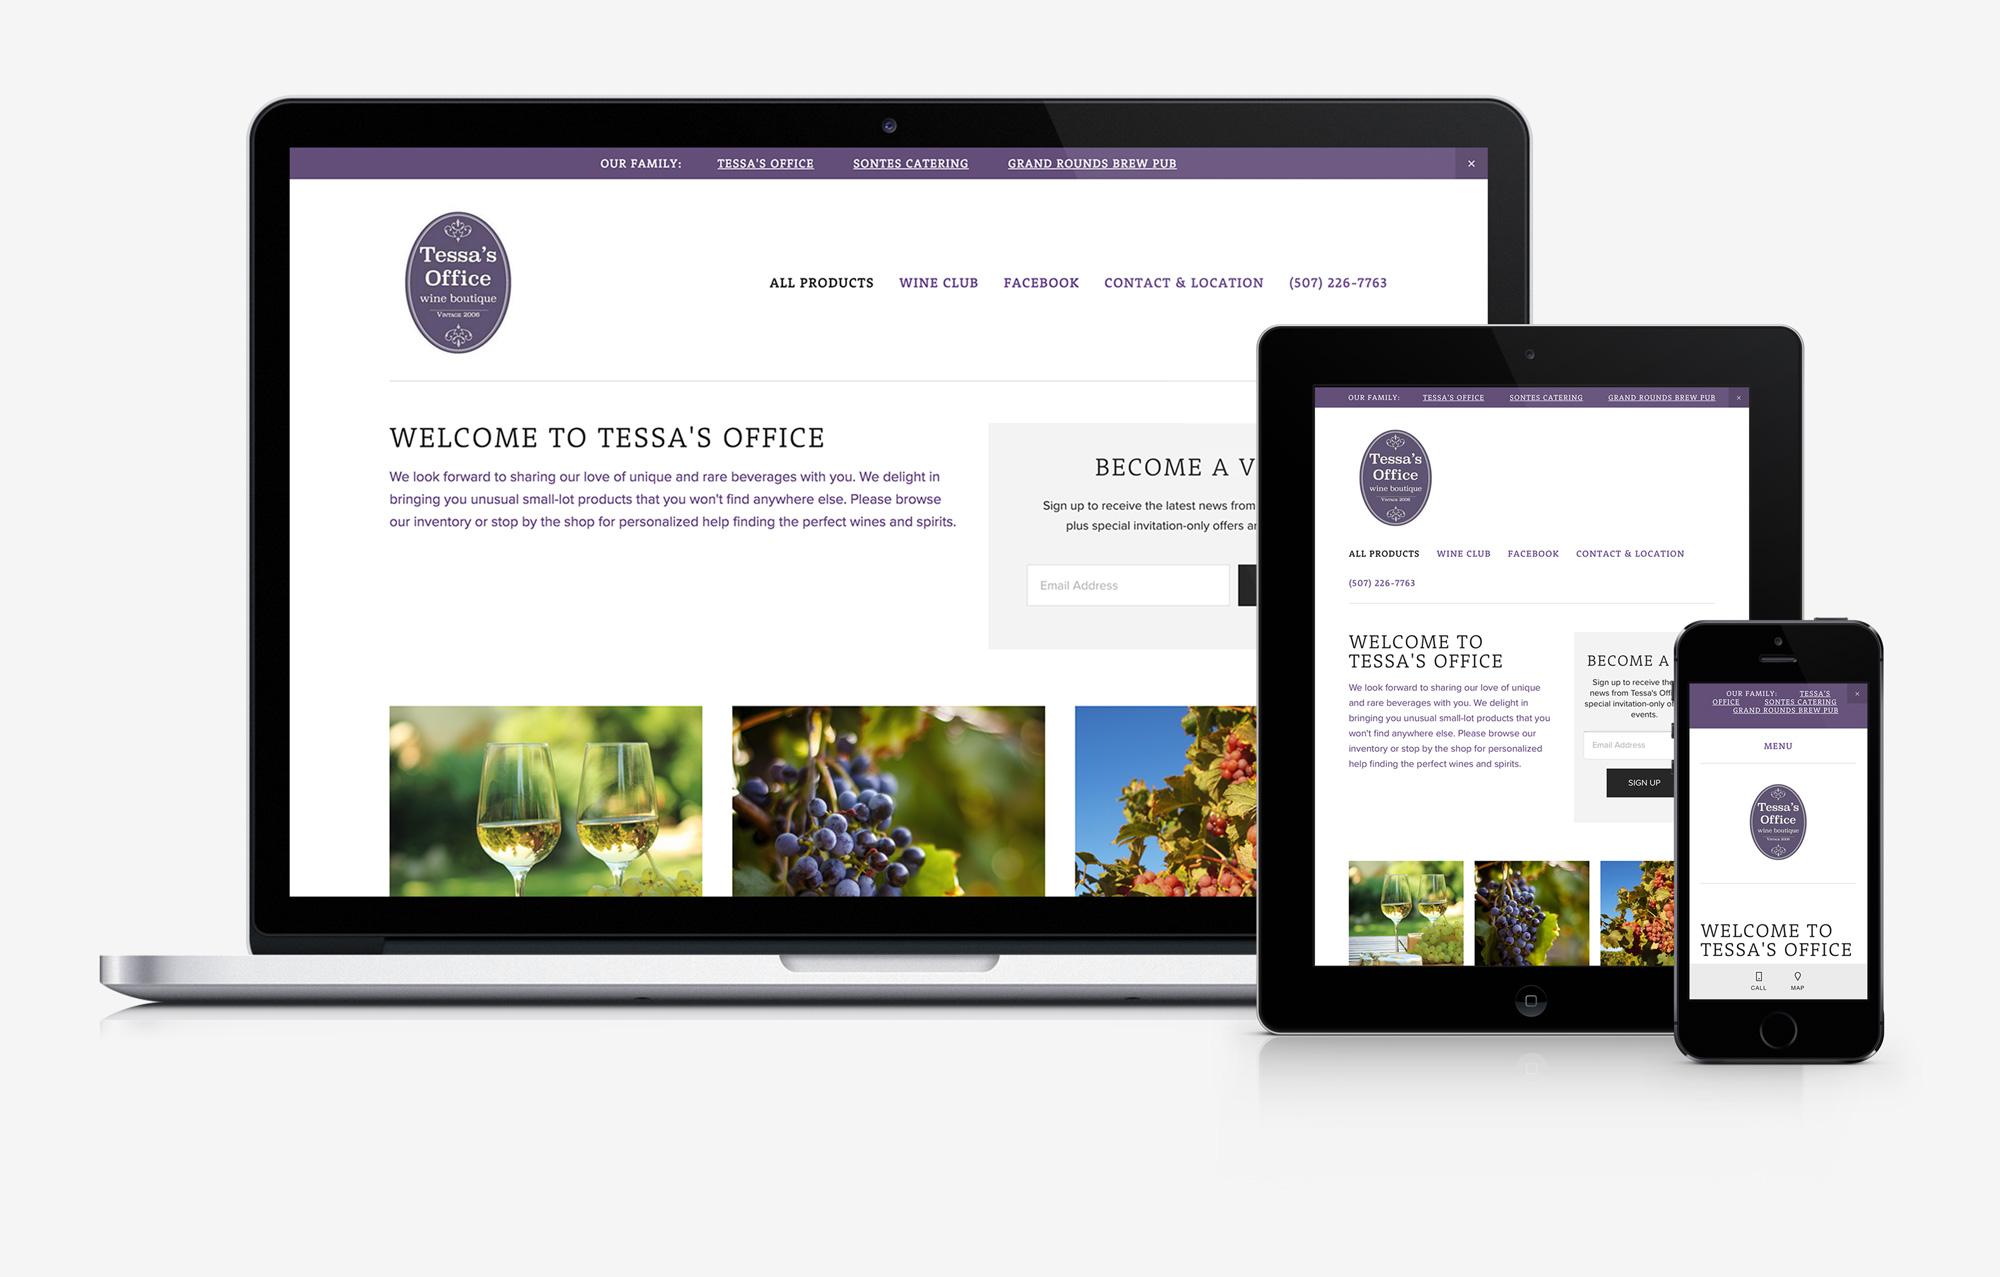 Tessa's Office responsive website design by PixelPress